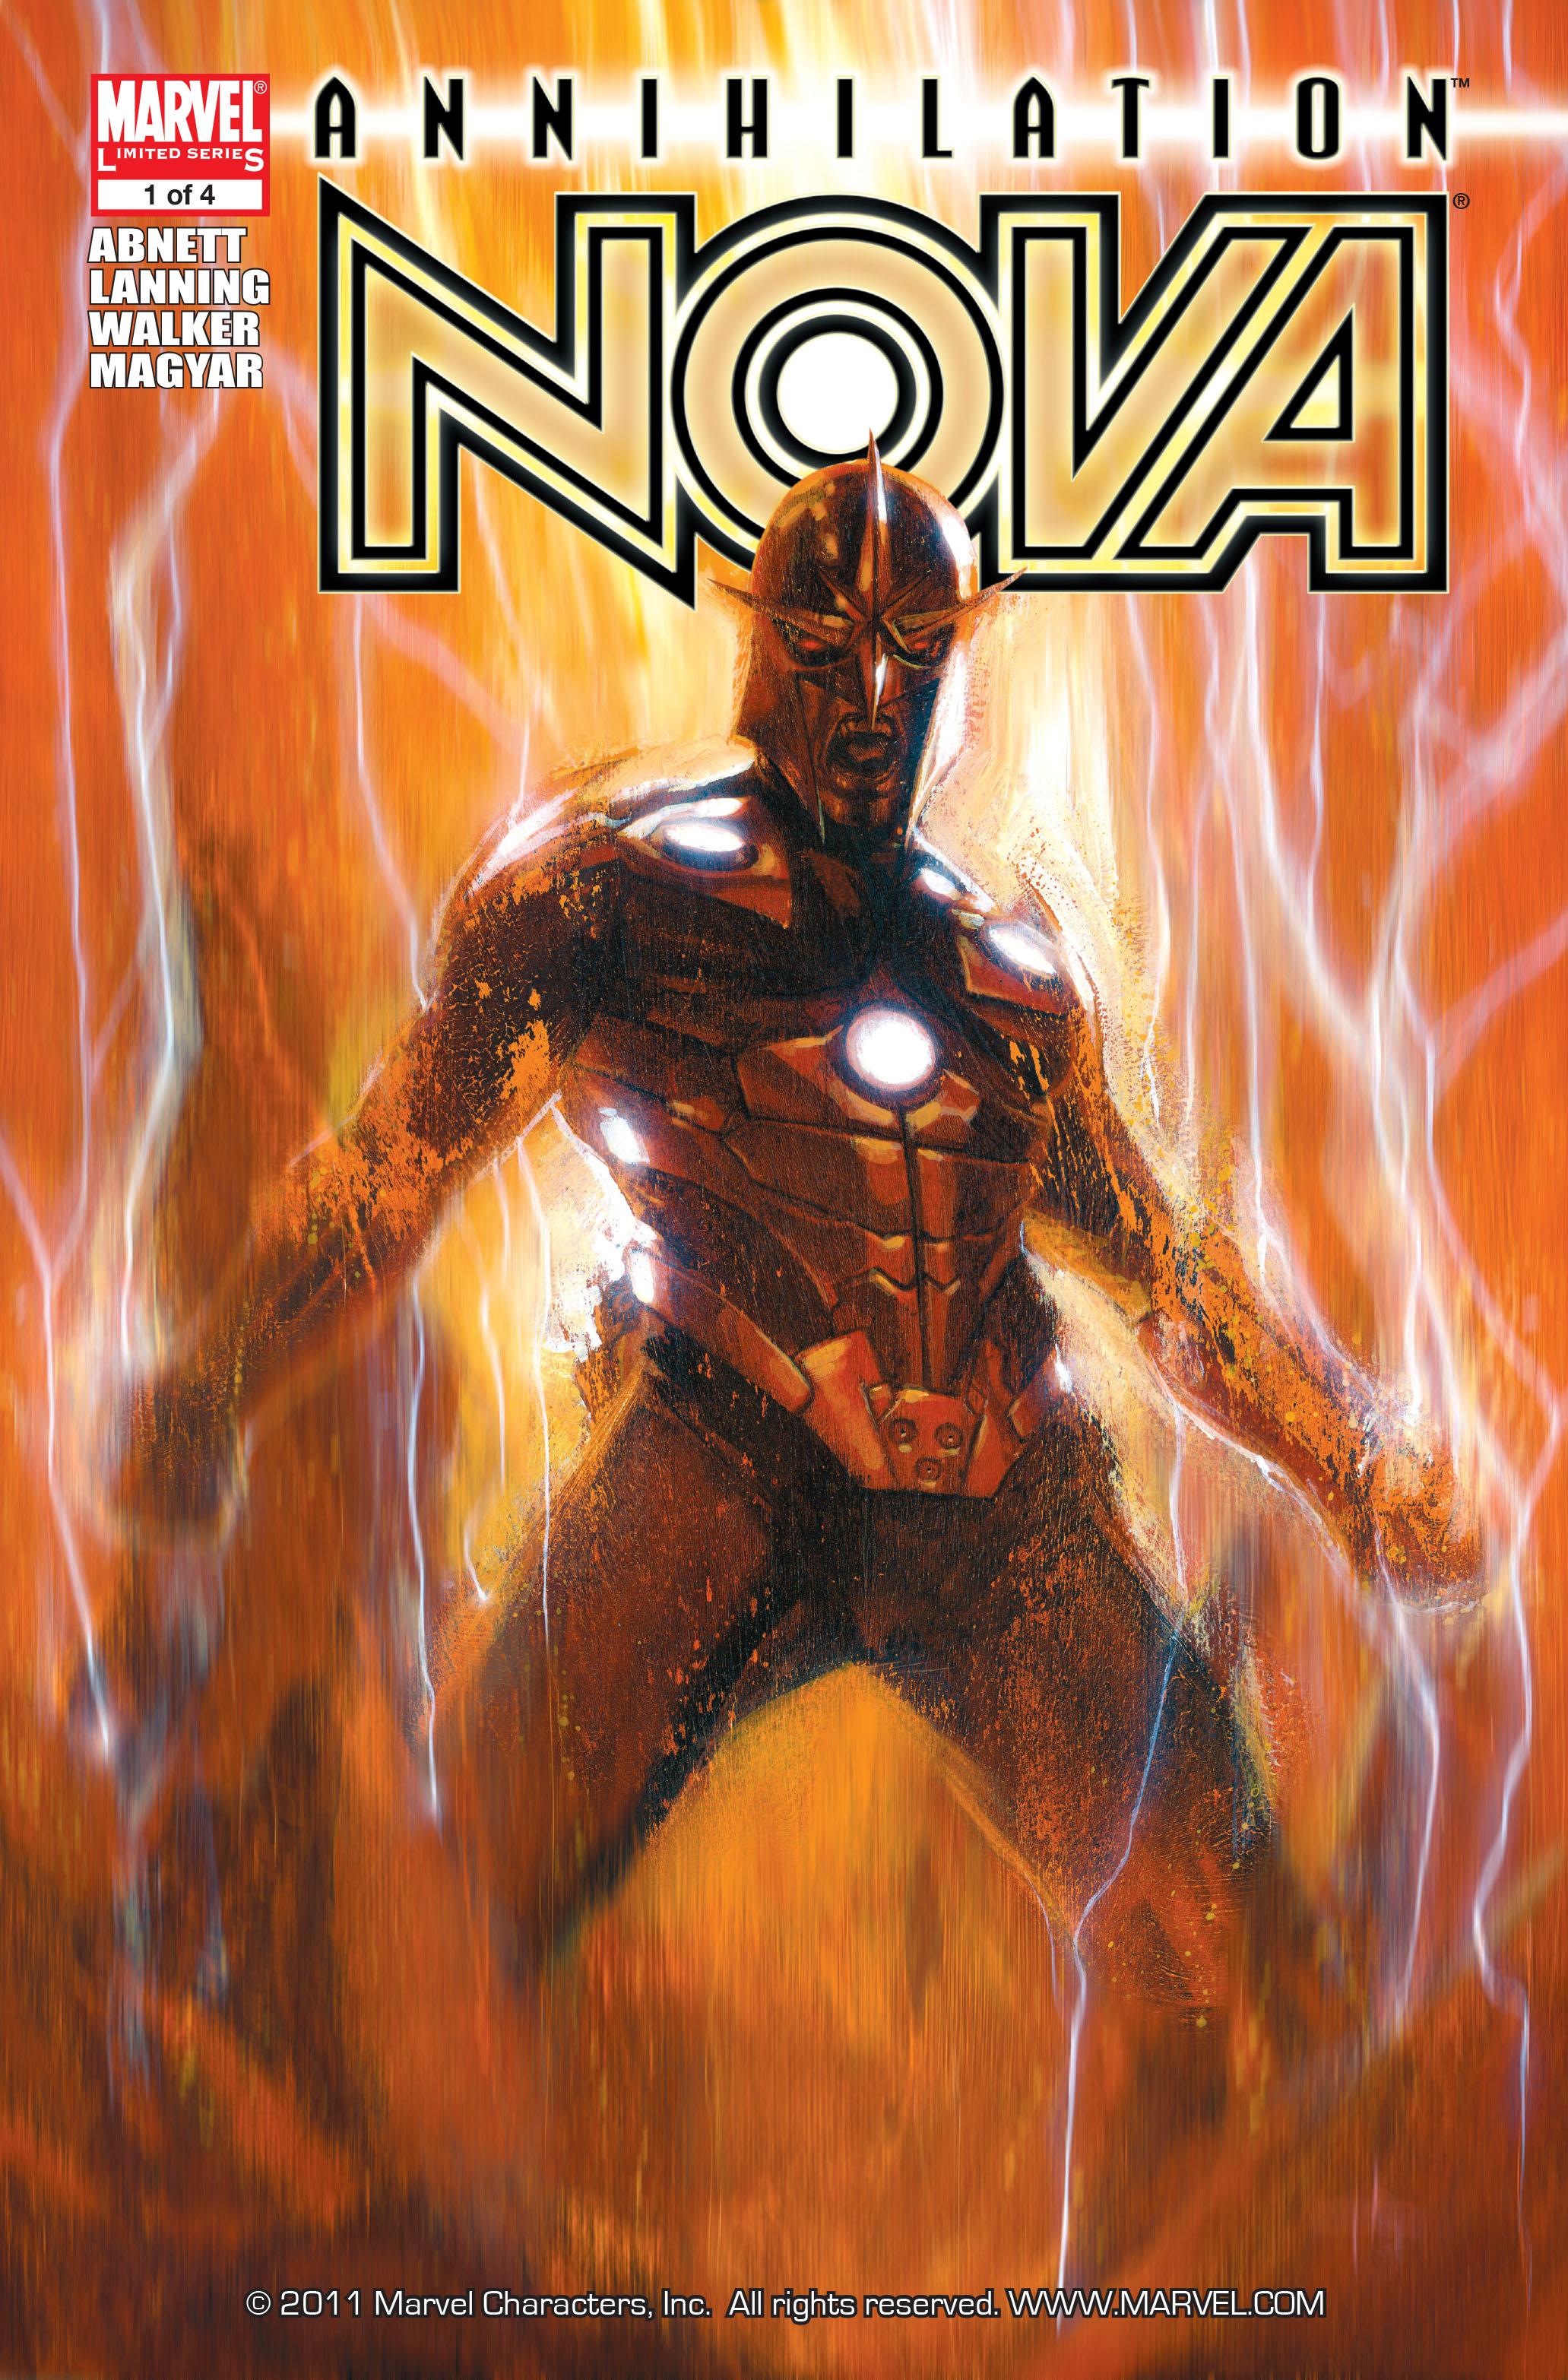 Read online Annihilation: Nova comic -  Issue #1 - 1